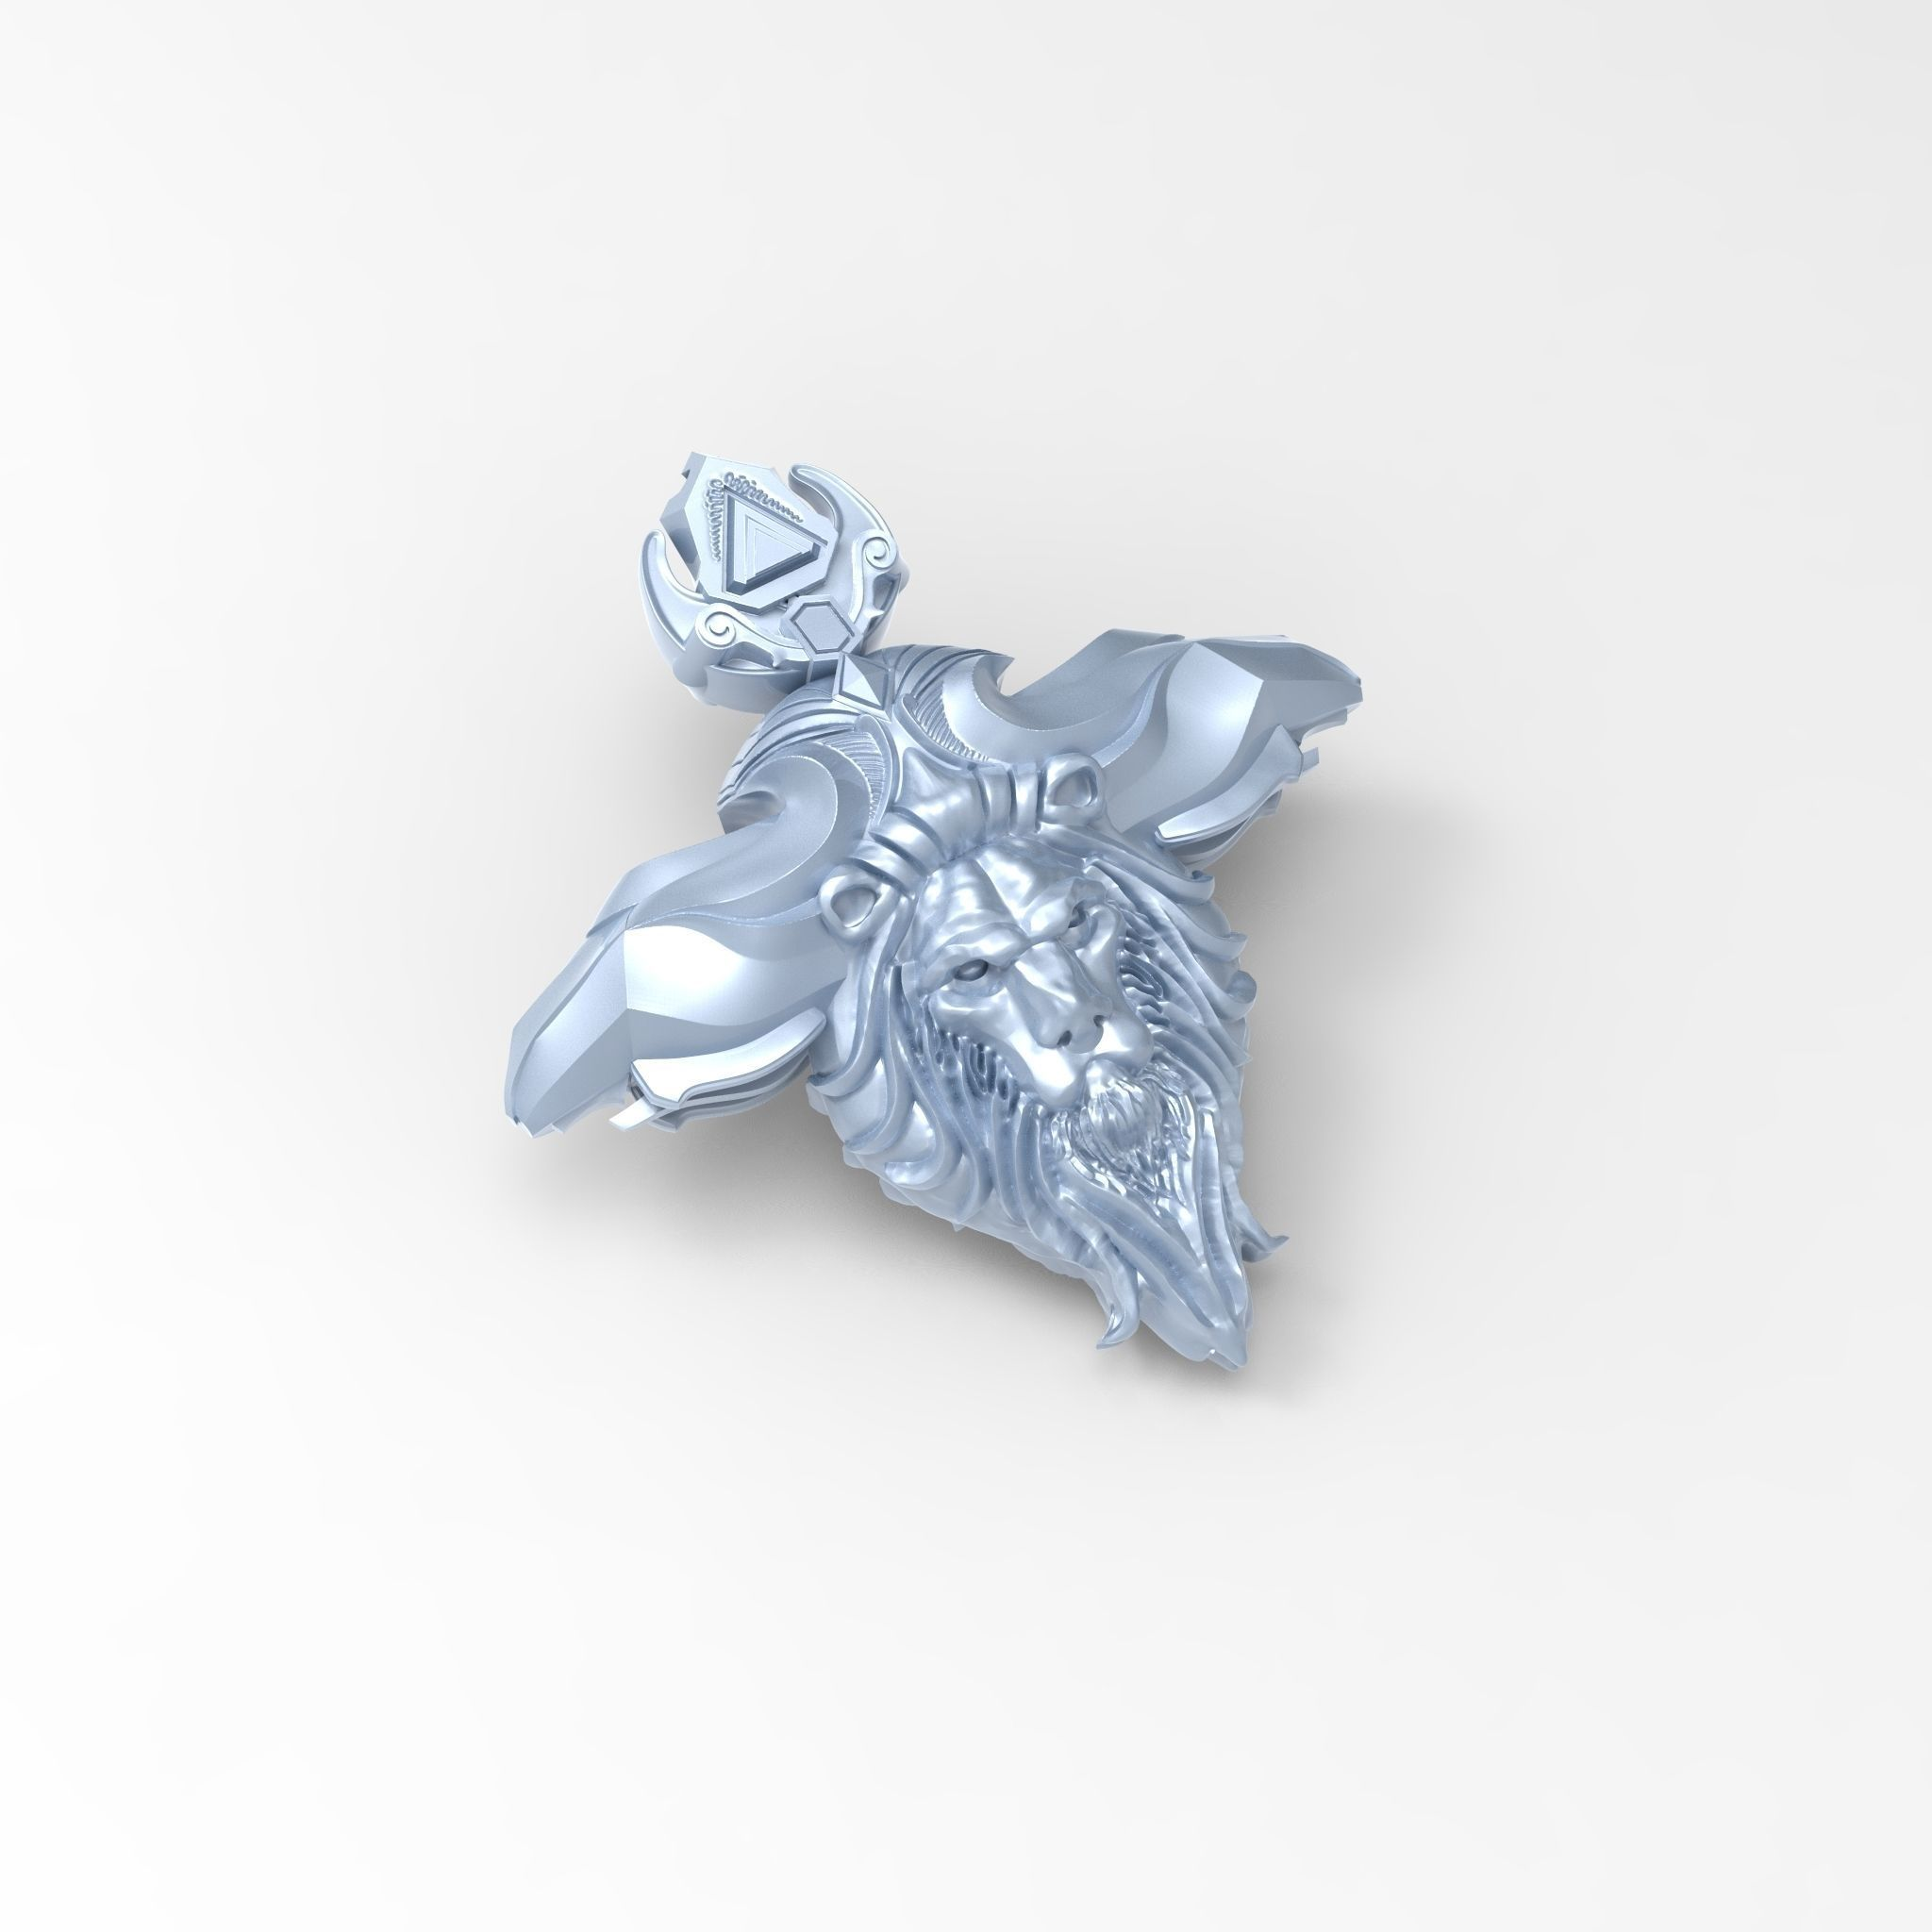 Warcraft Alliance Necklace